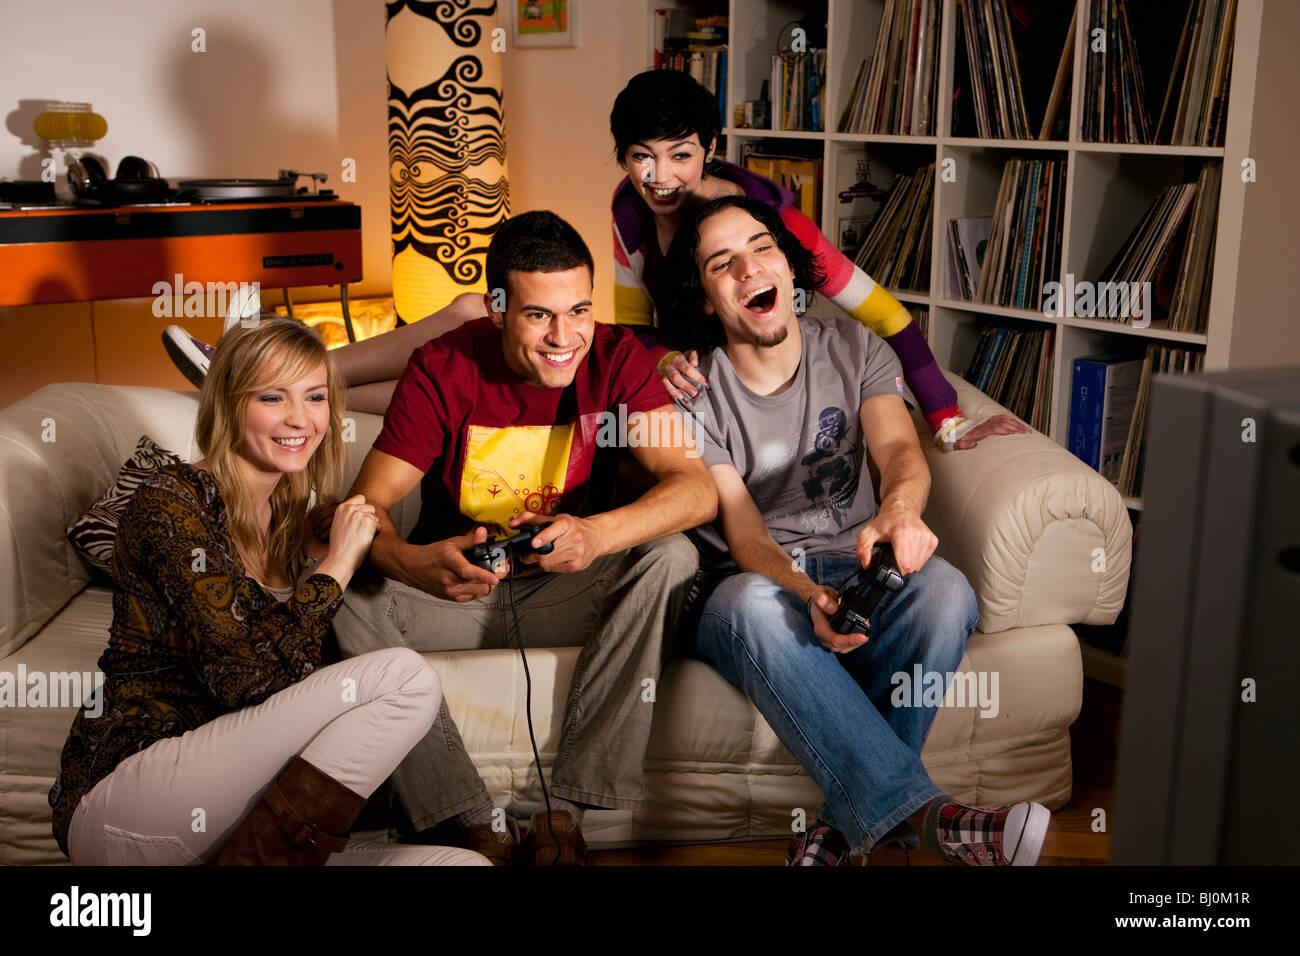 joy family friendly gaming - 850×565